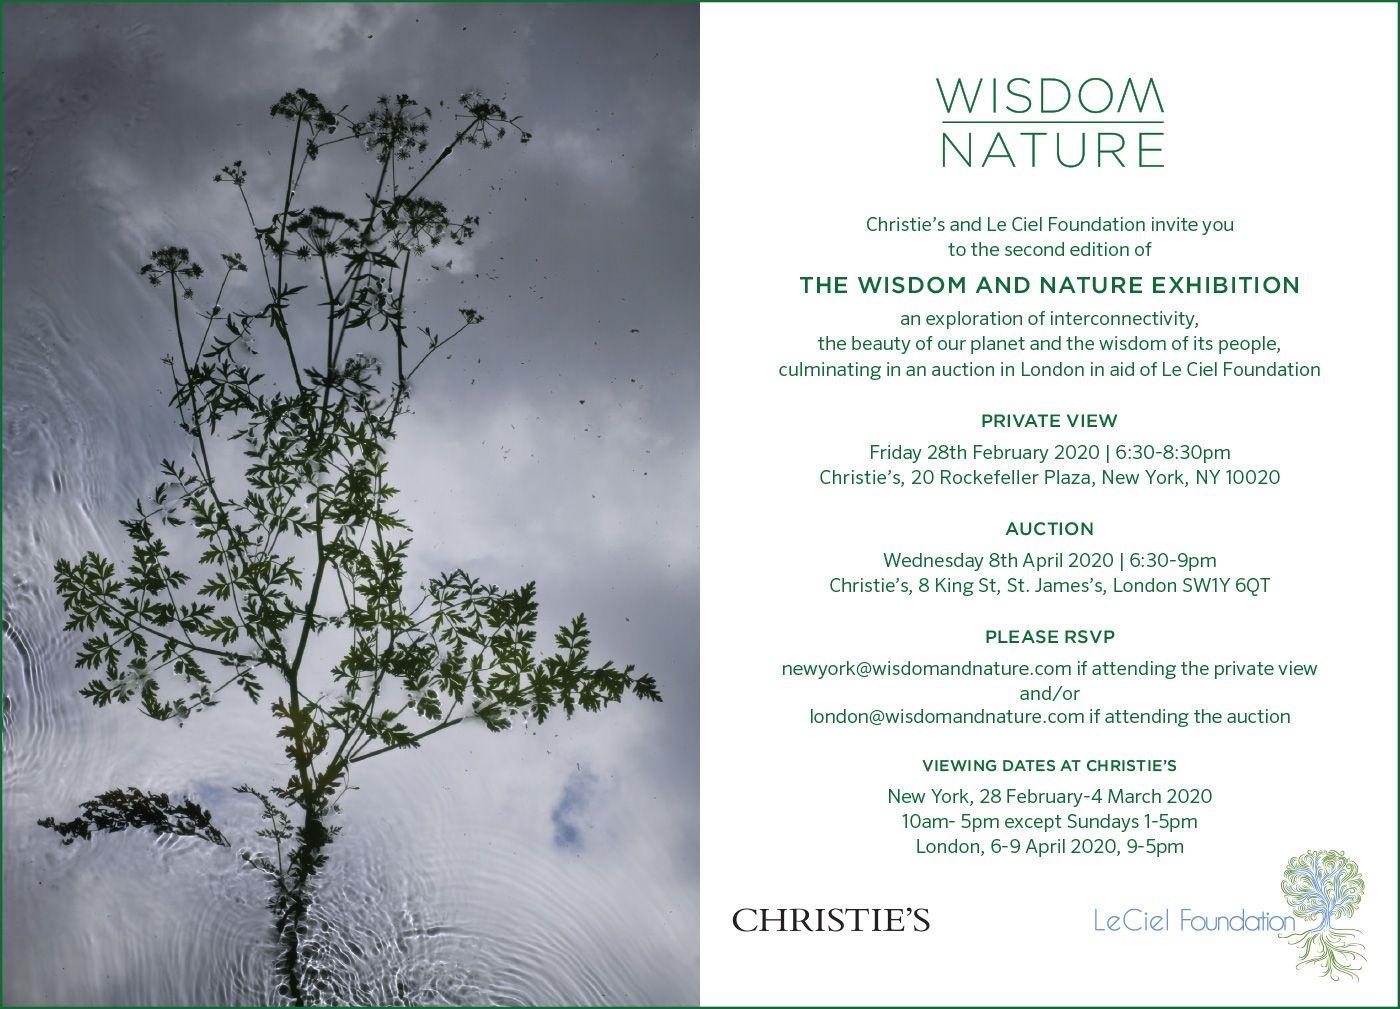 Wisdom-Nature-Invitation-1.jpg